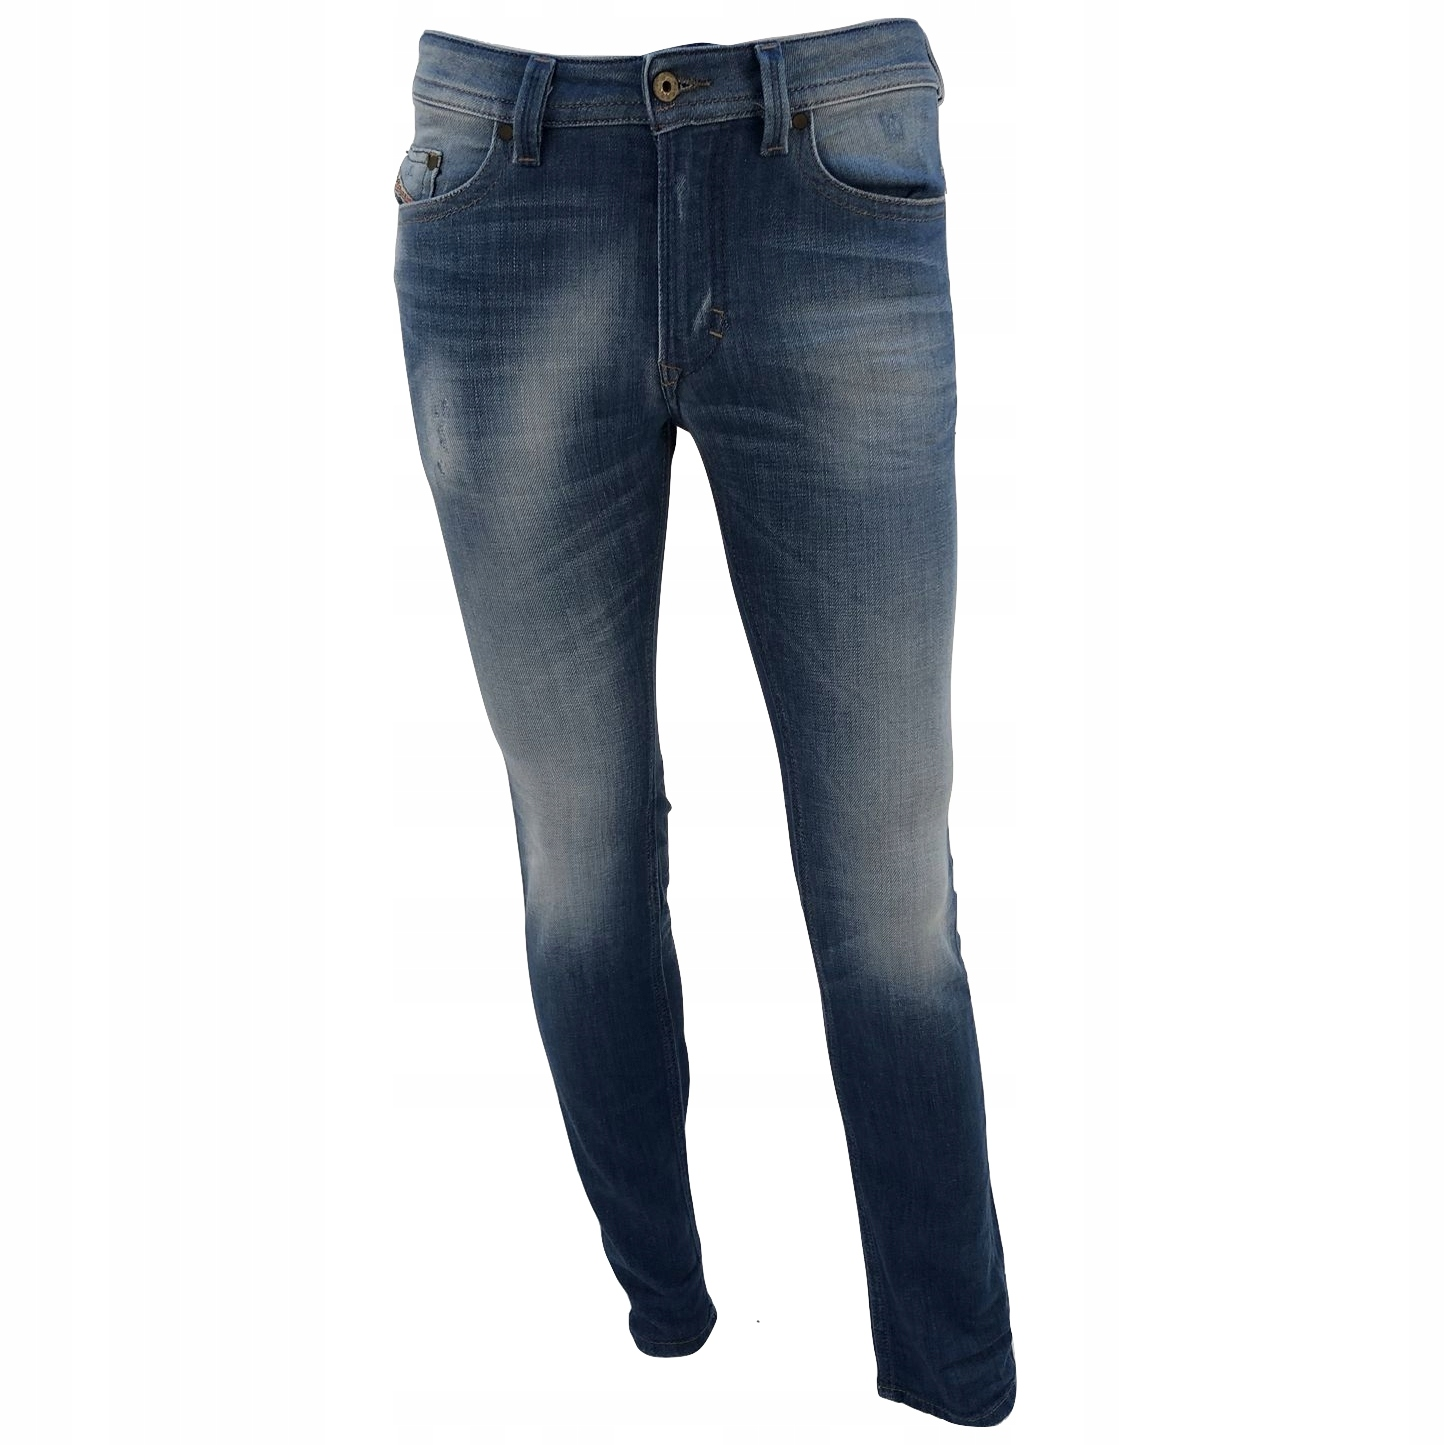 Spodnie Diesel Jeans THAVAR 0855G 01 28x32 -60%